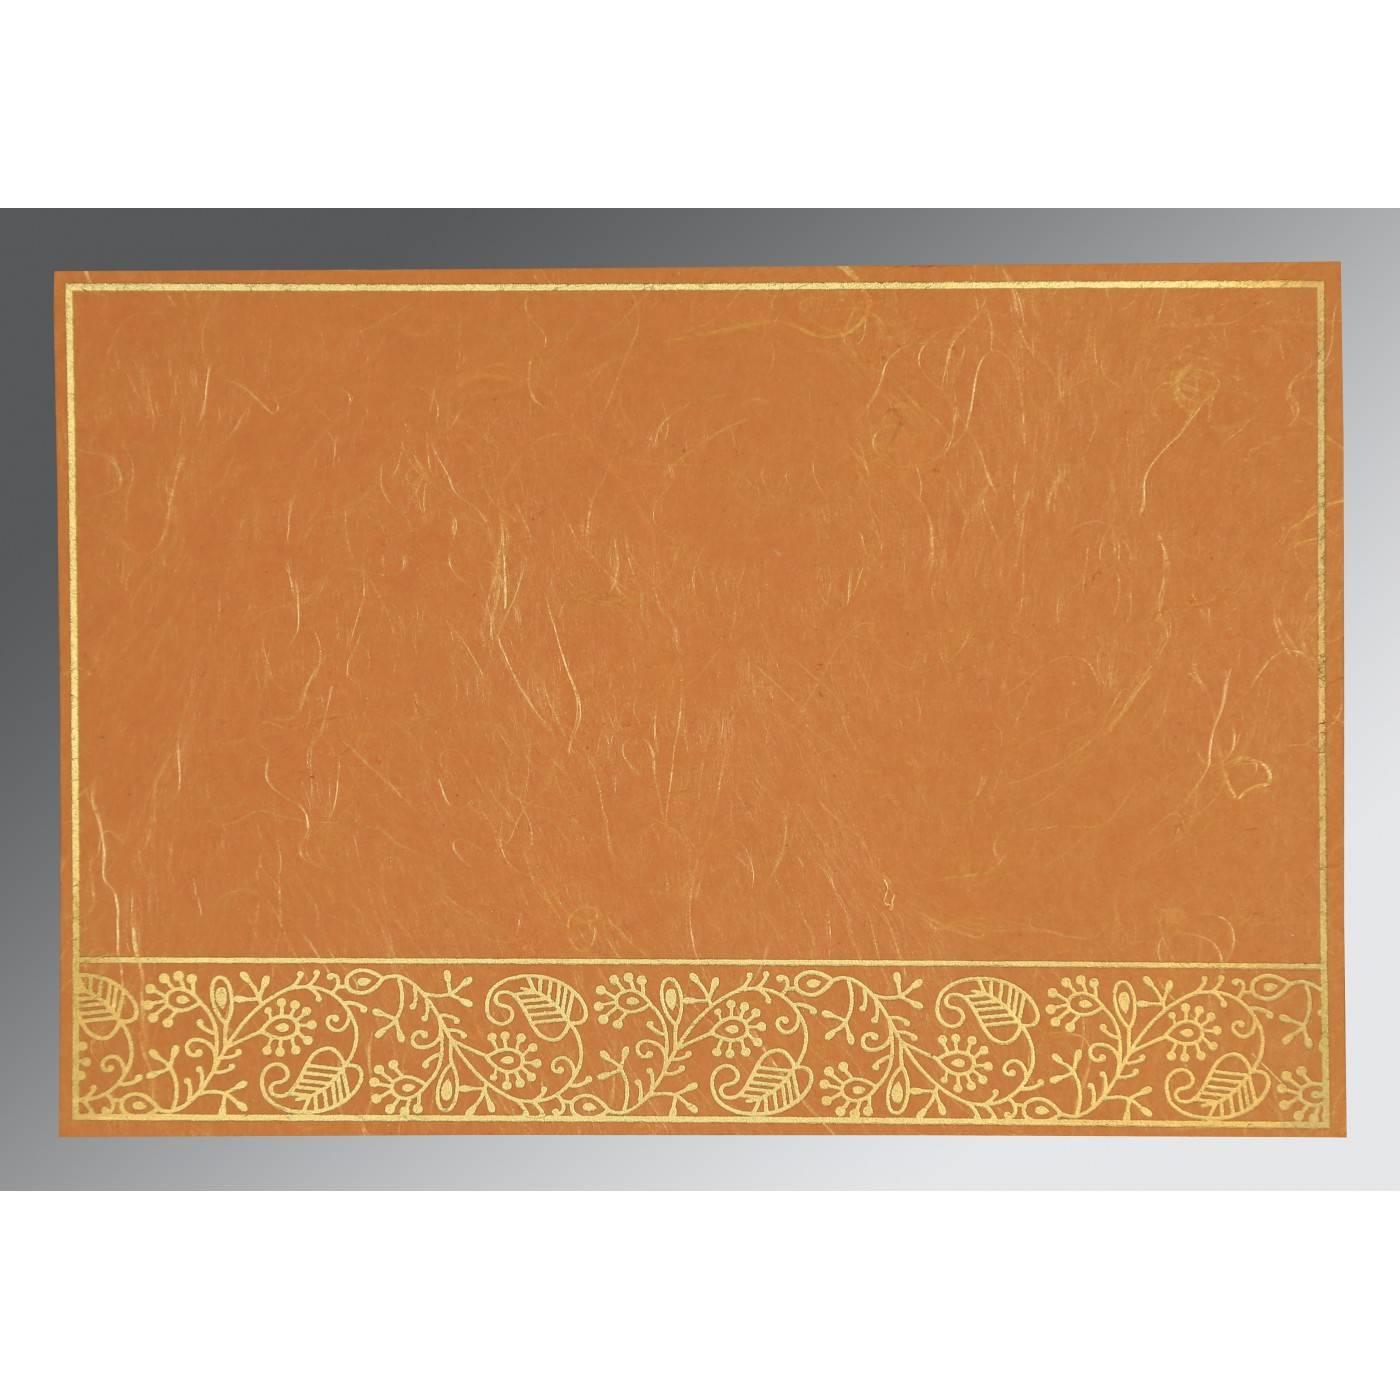 BURNT ORANGE HANDMADE SILK SCREEN PRINTED WEDDING CARD : CG-8215L - IndianWeddingCards